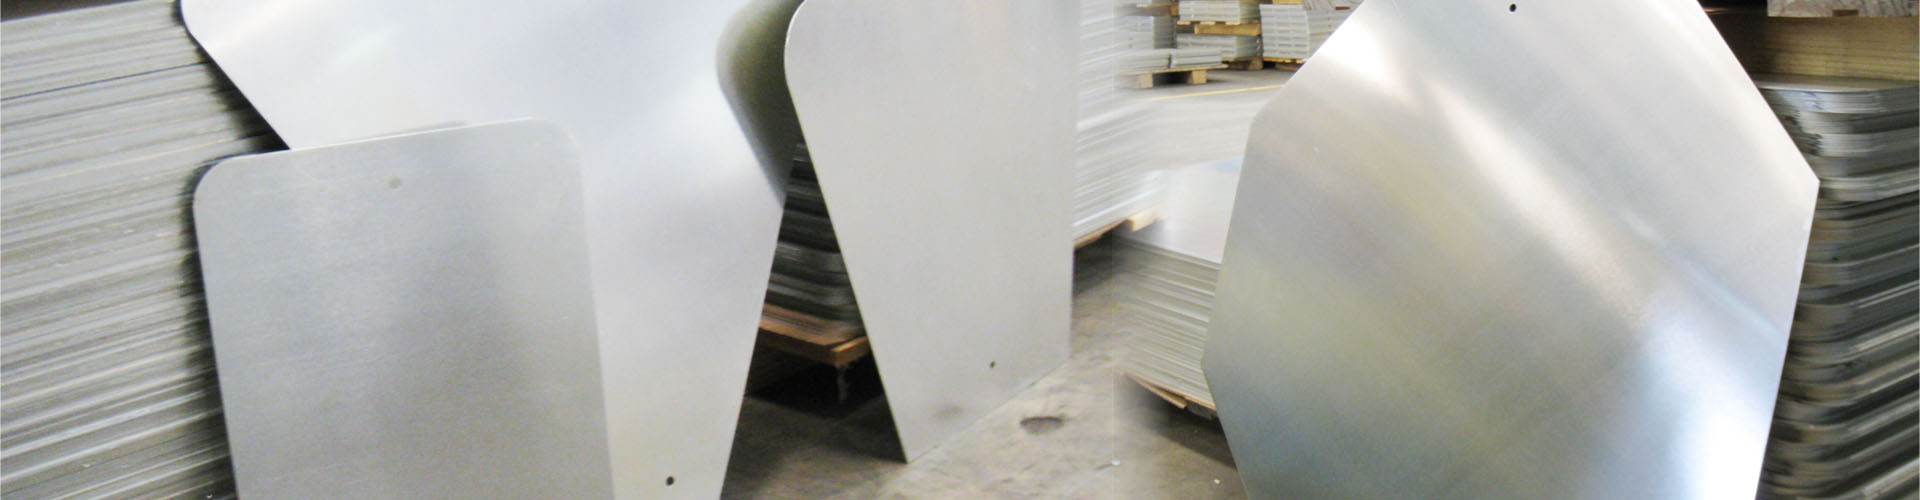 Vulcan Aluminum Stock Blanks